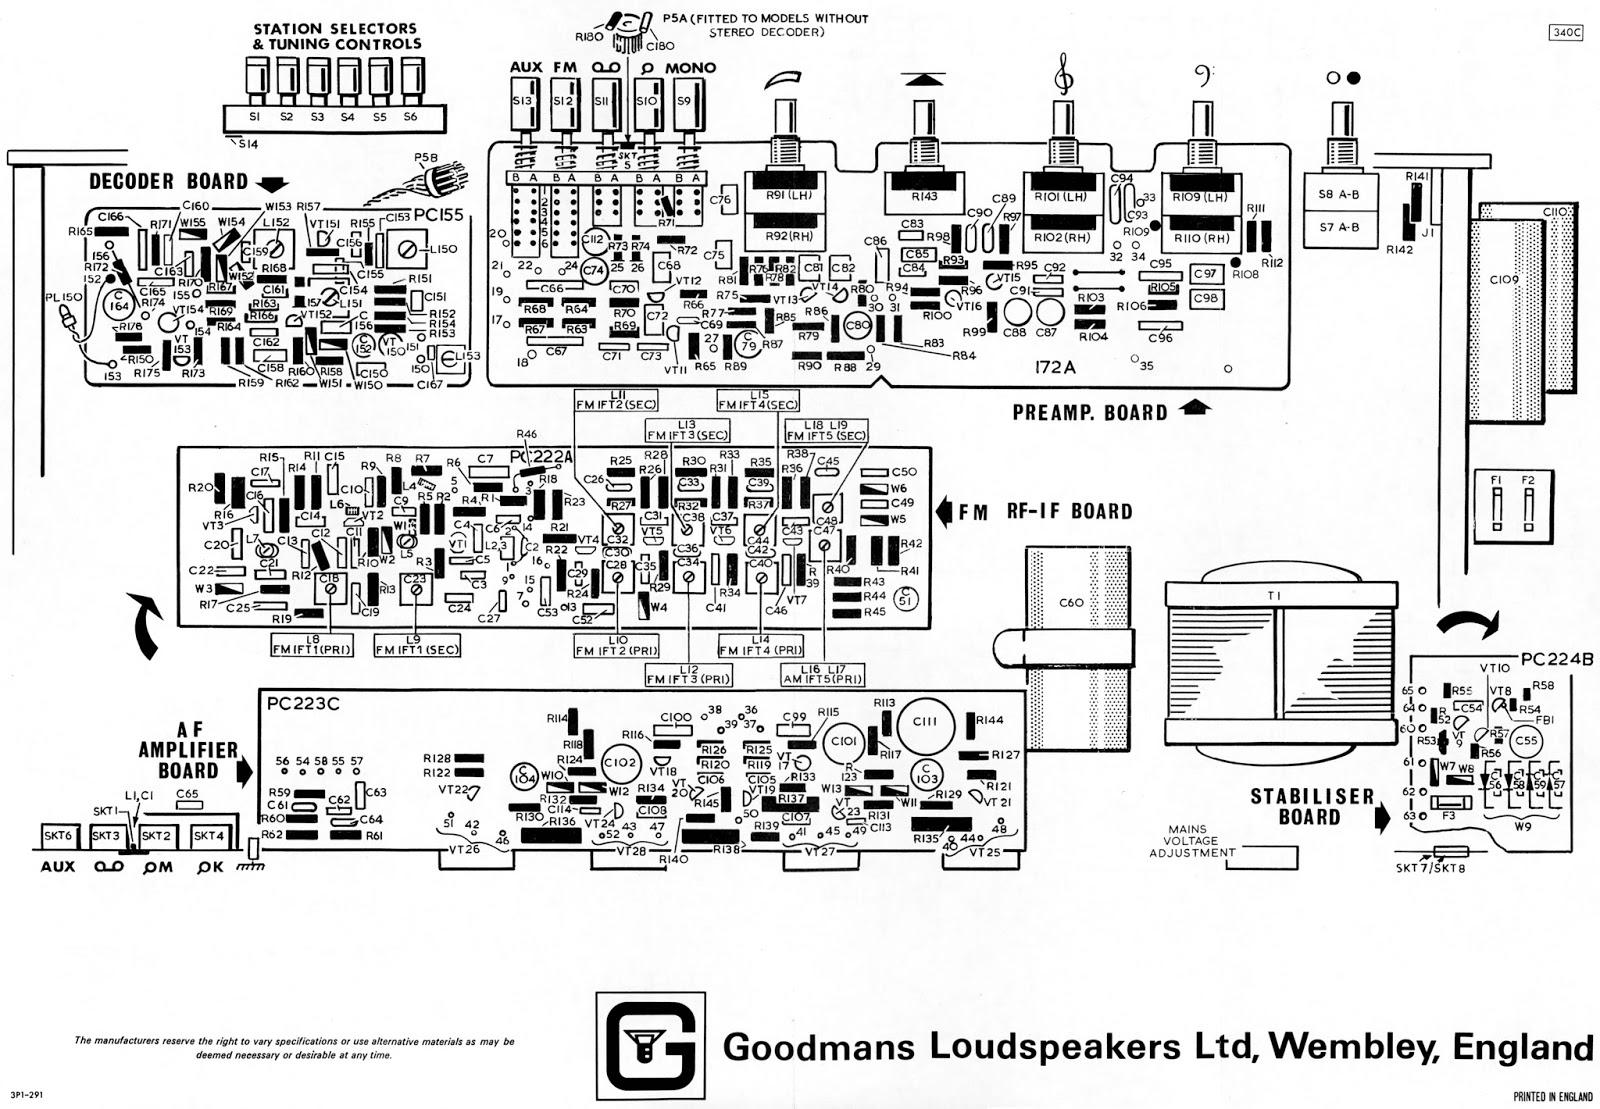 blugoo u0026 39 s bl0g  goodmans 3000 series vintage audio